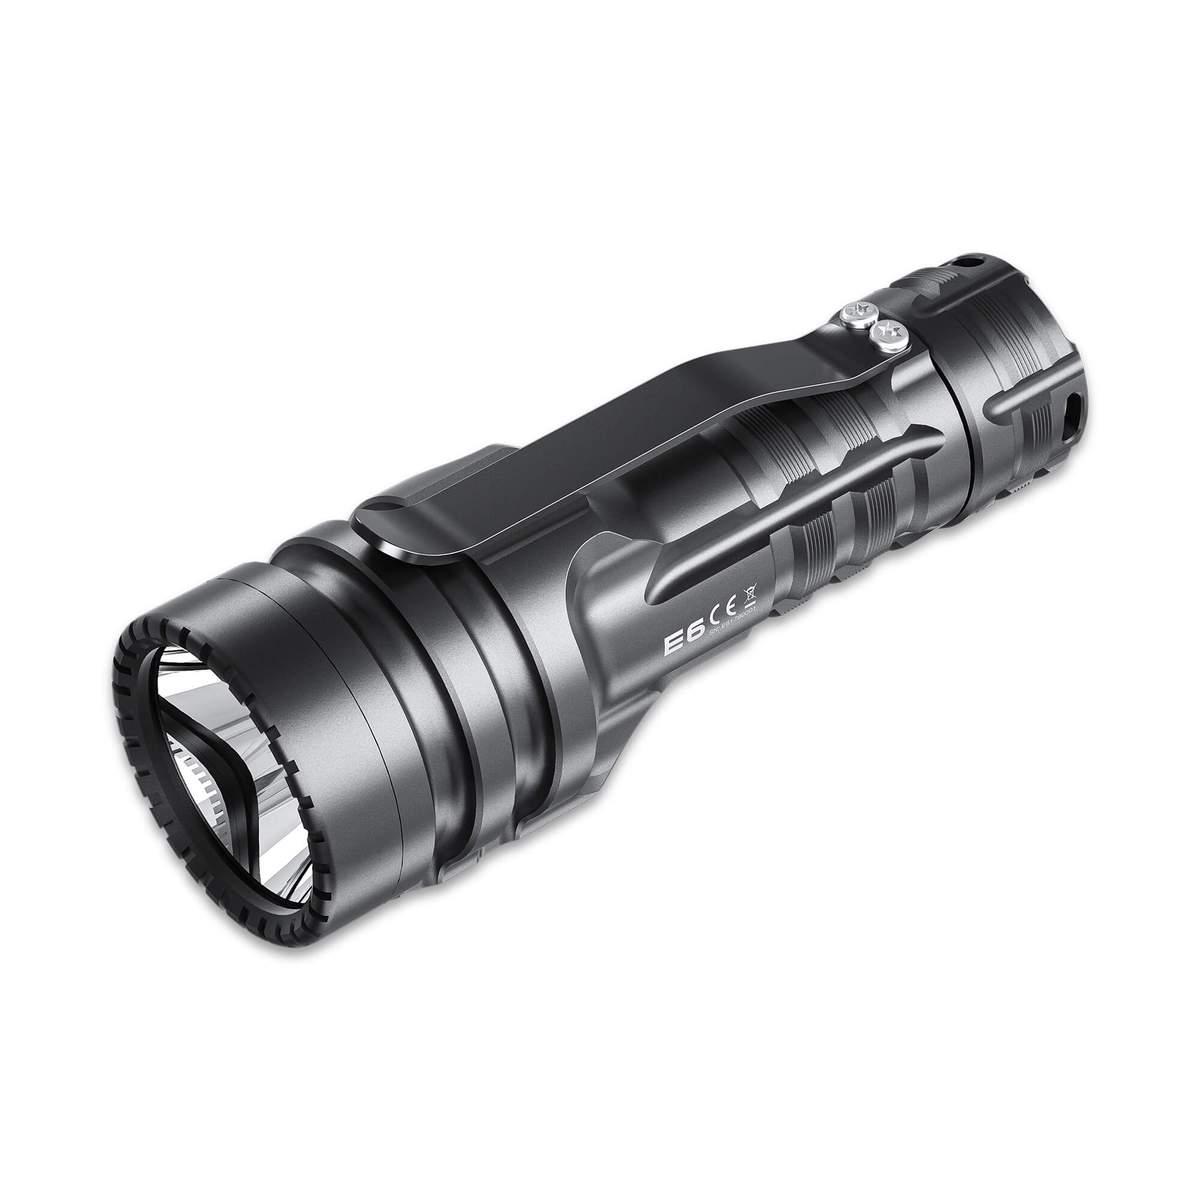 WUBEN E6 mini Thrower flashlight + Website 2021 Summer Discount $46.99